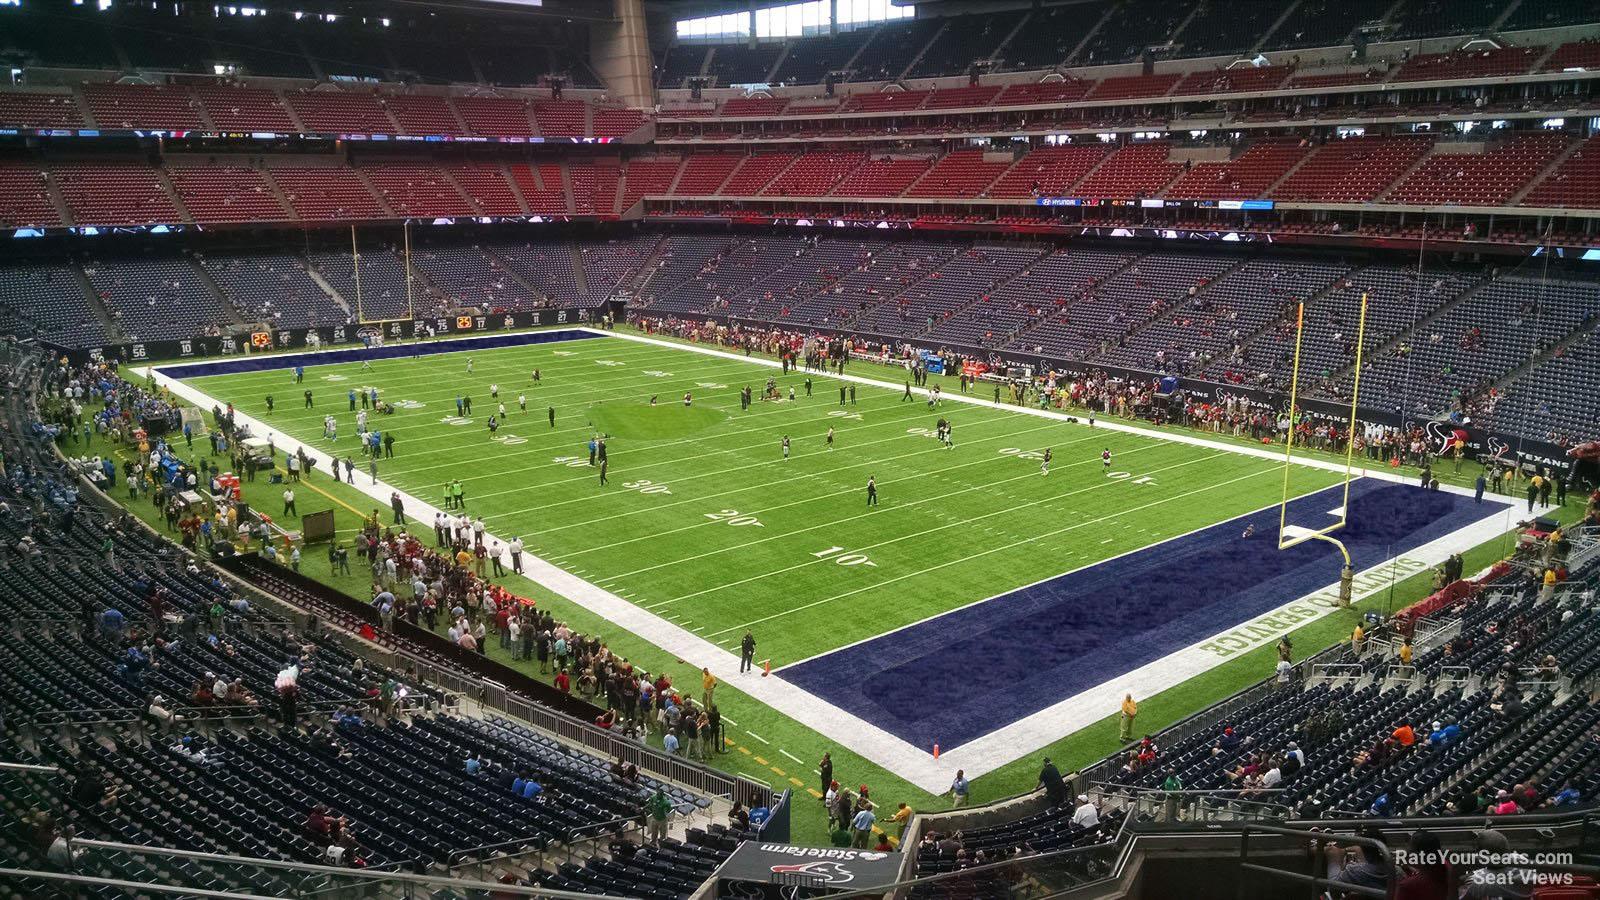 West Houston Vw >> NRG Stadium Section 330 - Houston Texans - RateYourSeats.com